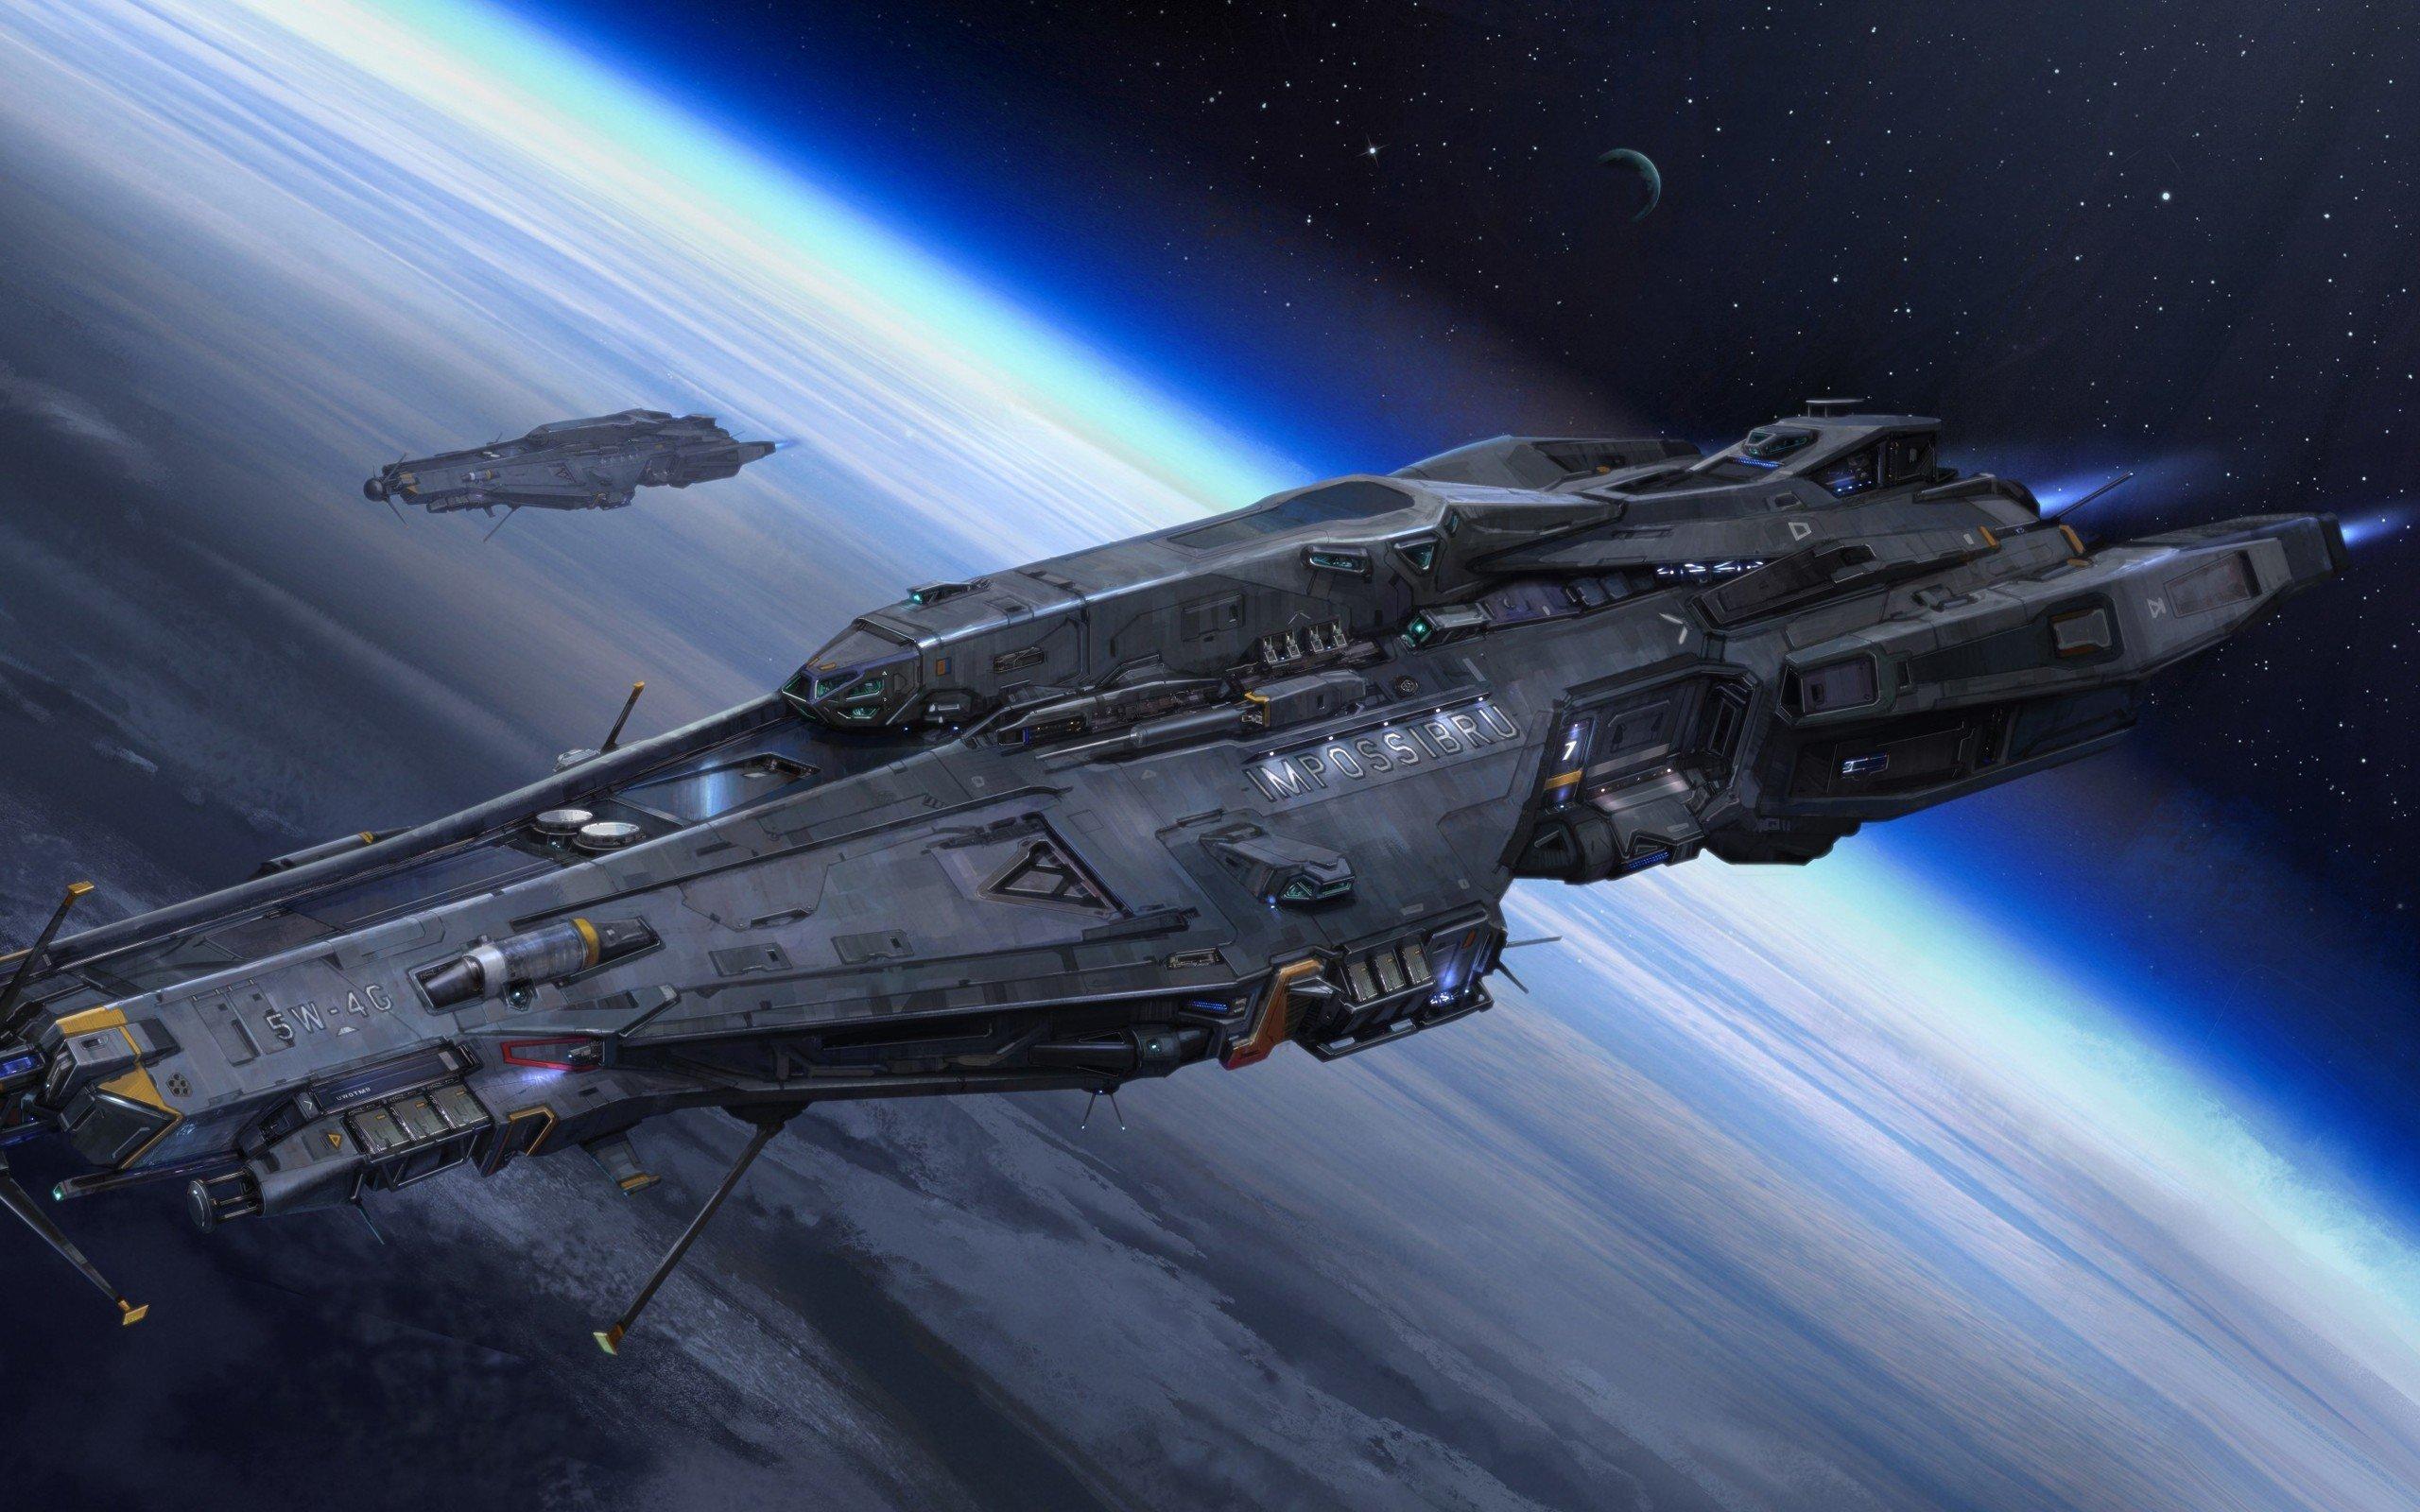 space, Ship, Planet, Futuristic, Science fiction Wallpaper